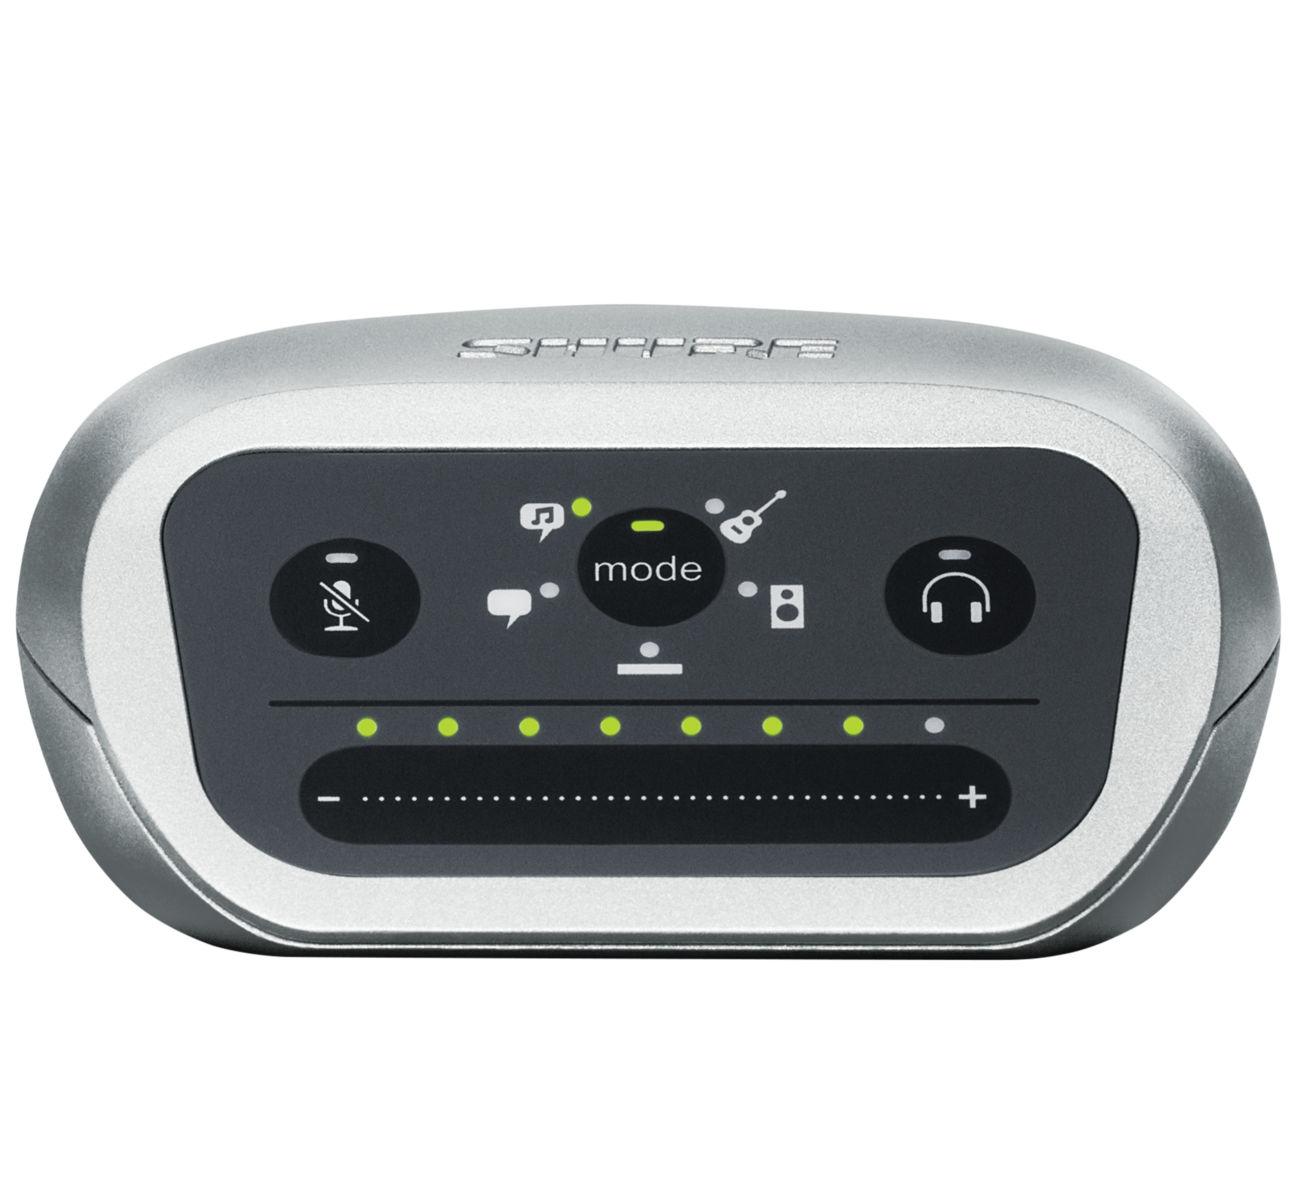 Shure MVi Digital Audio Recording Interface